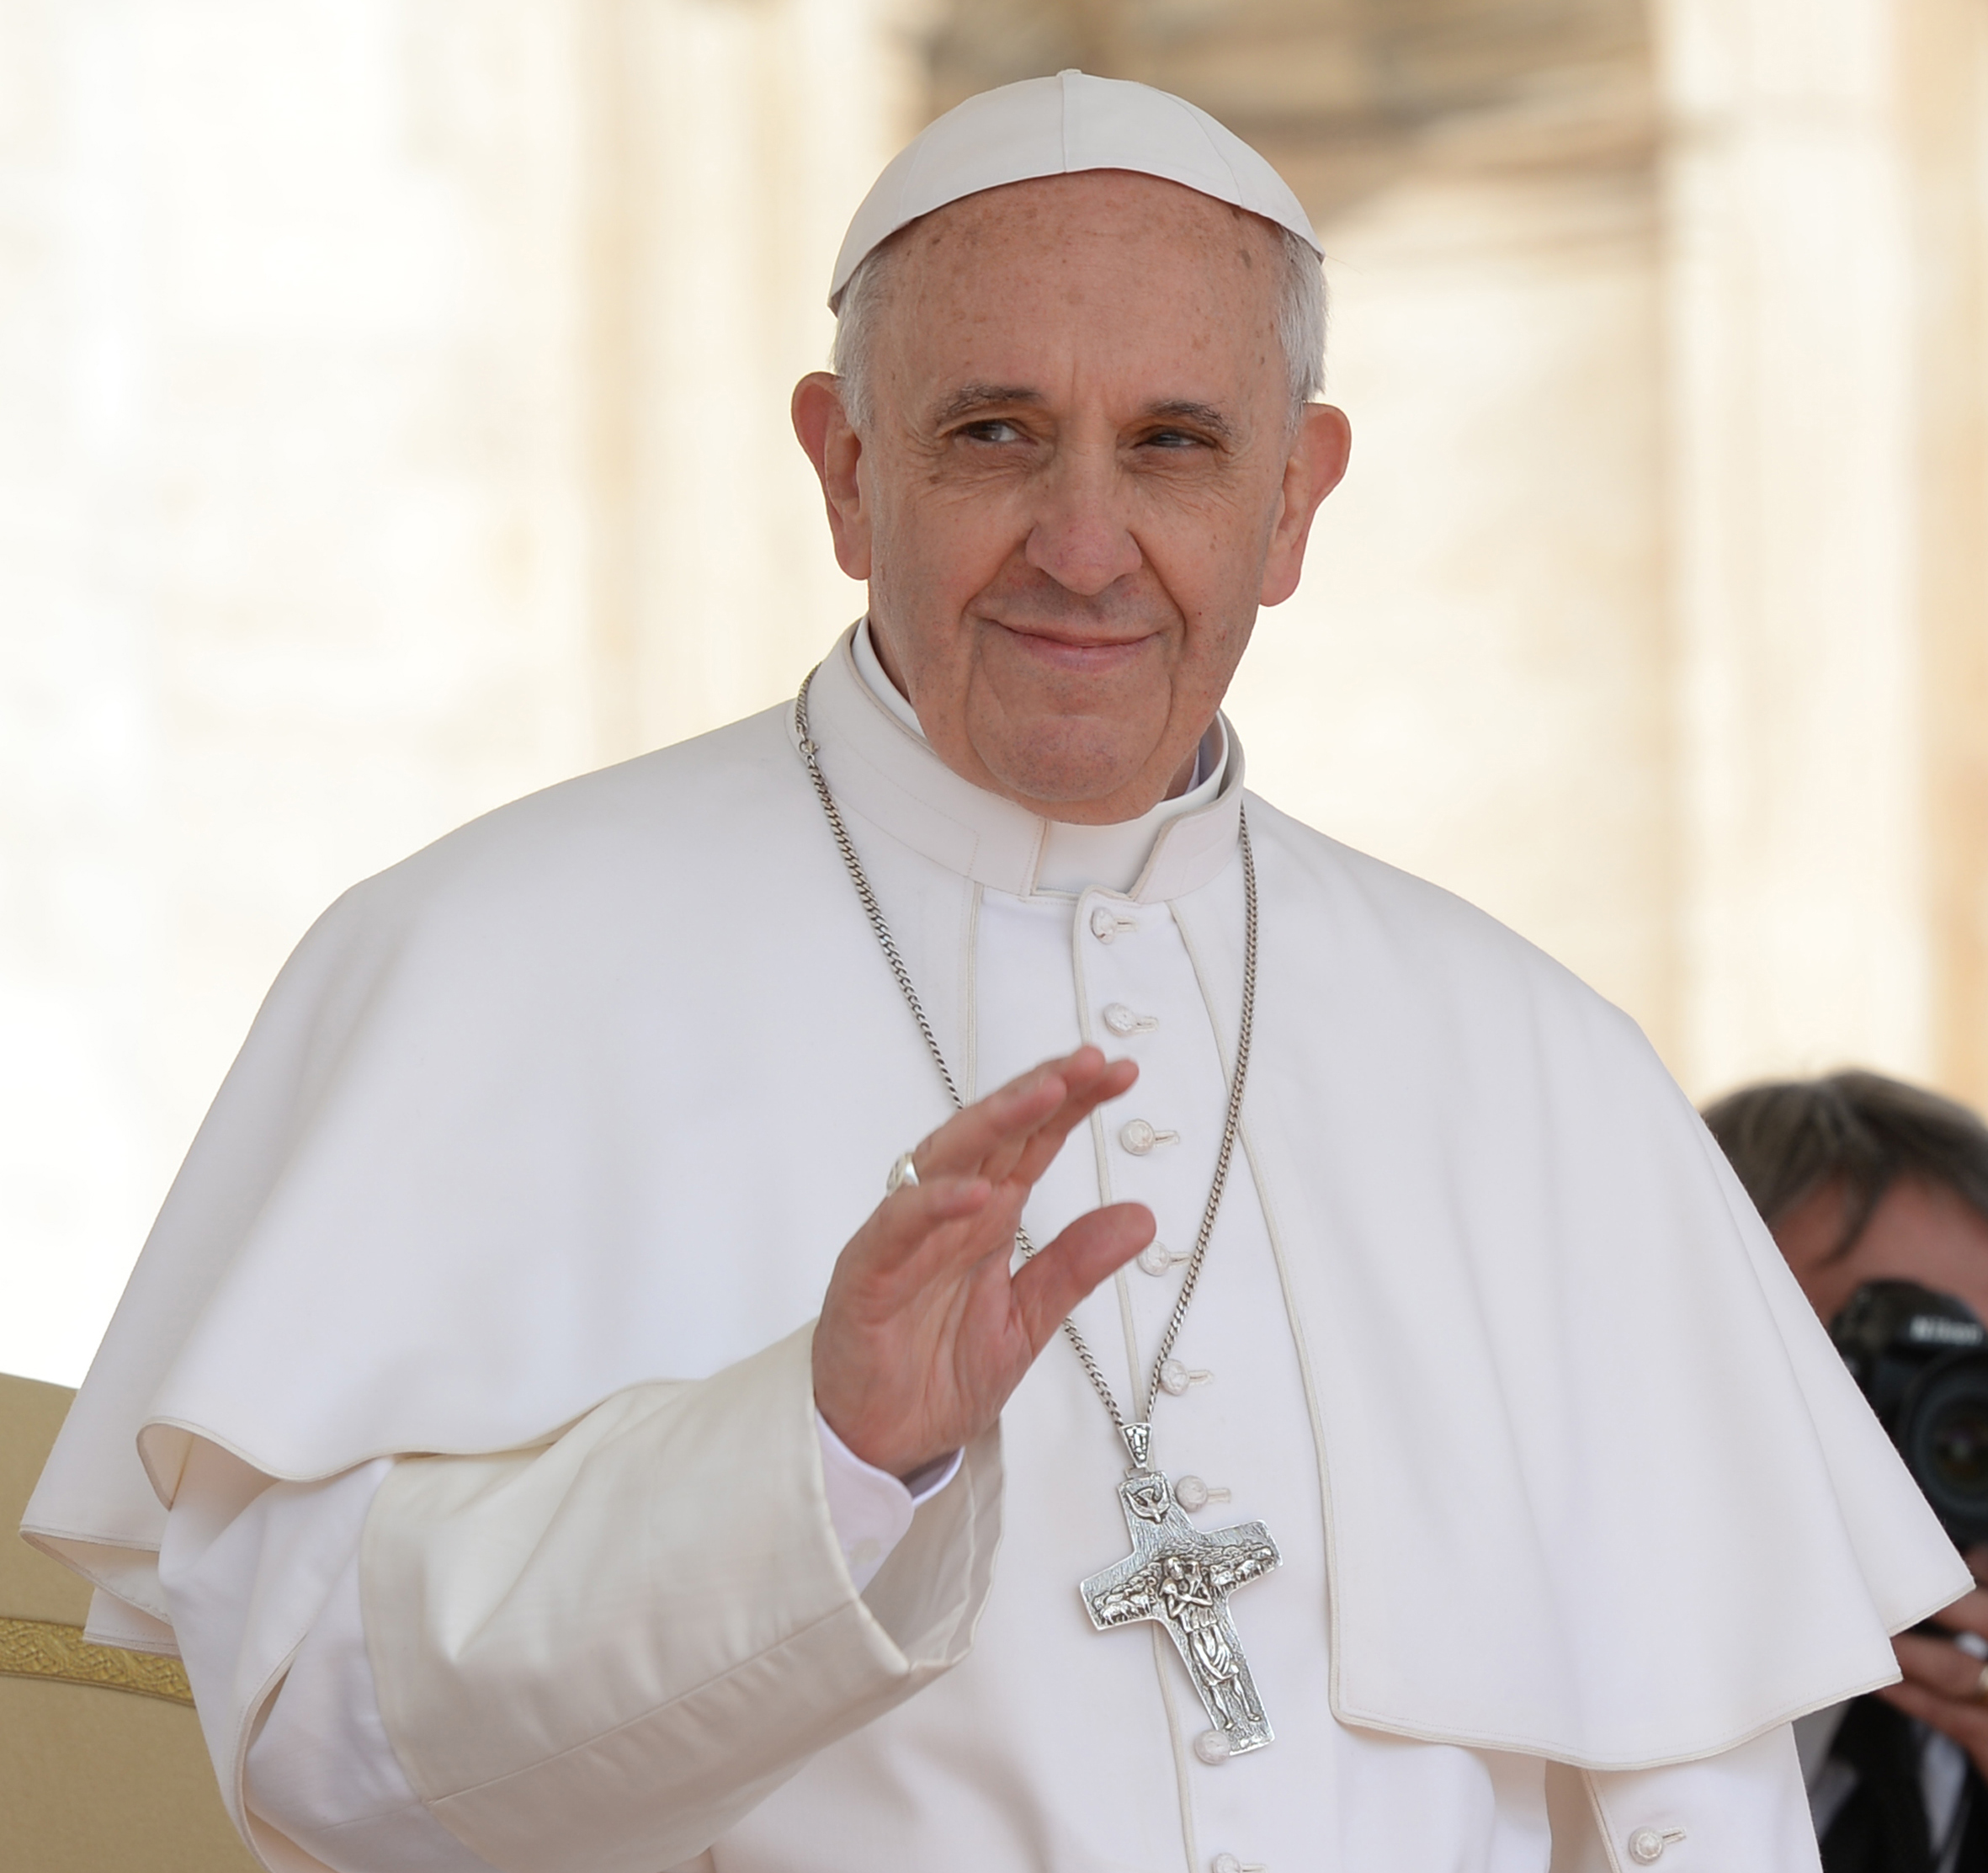 download Pope Francis God Lights [2362x2225] for your Desktop 2362x2225